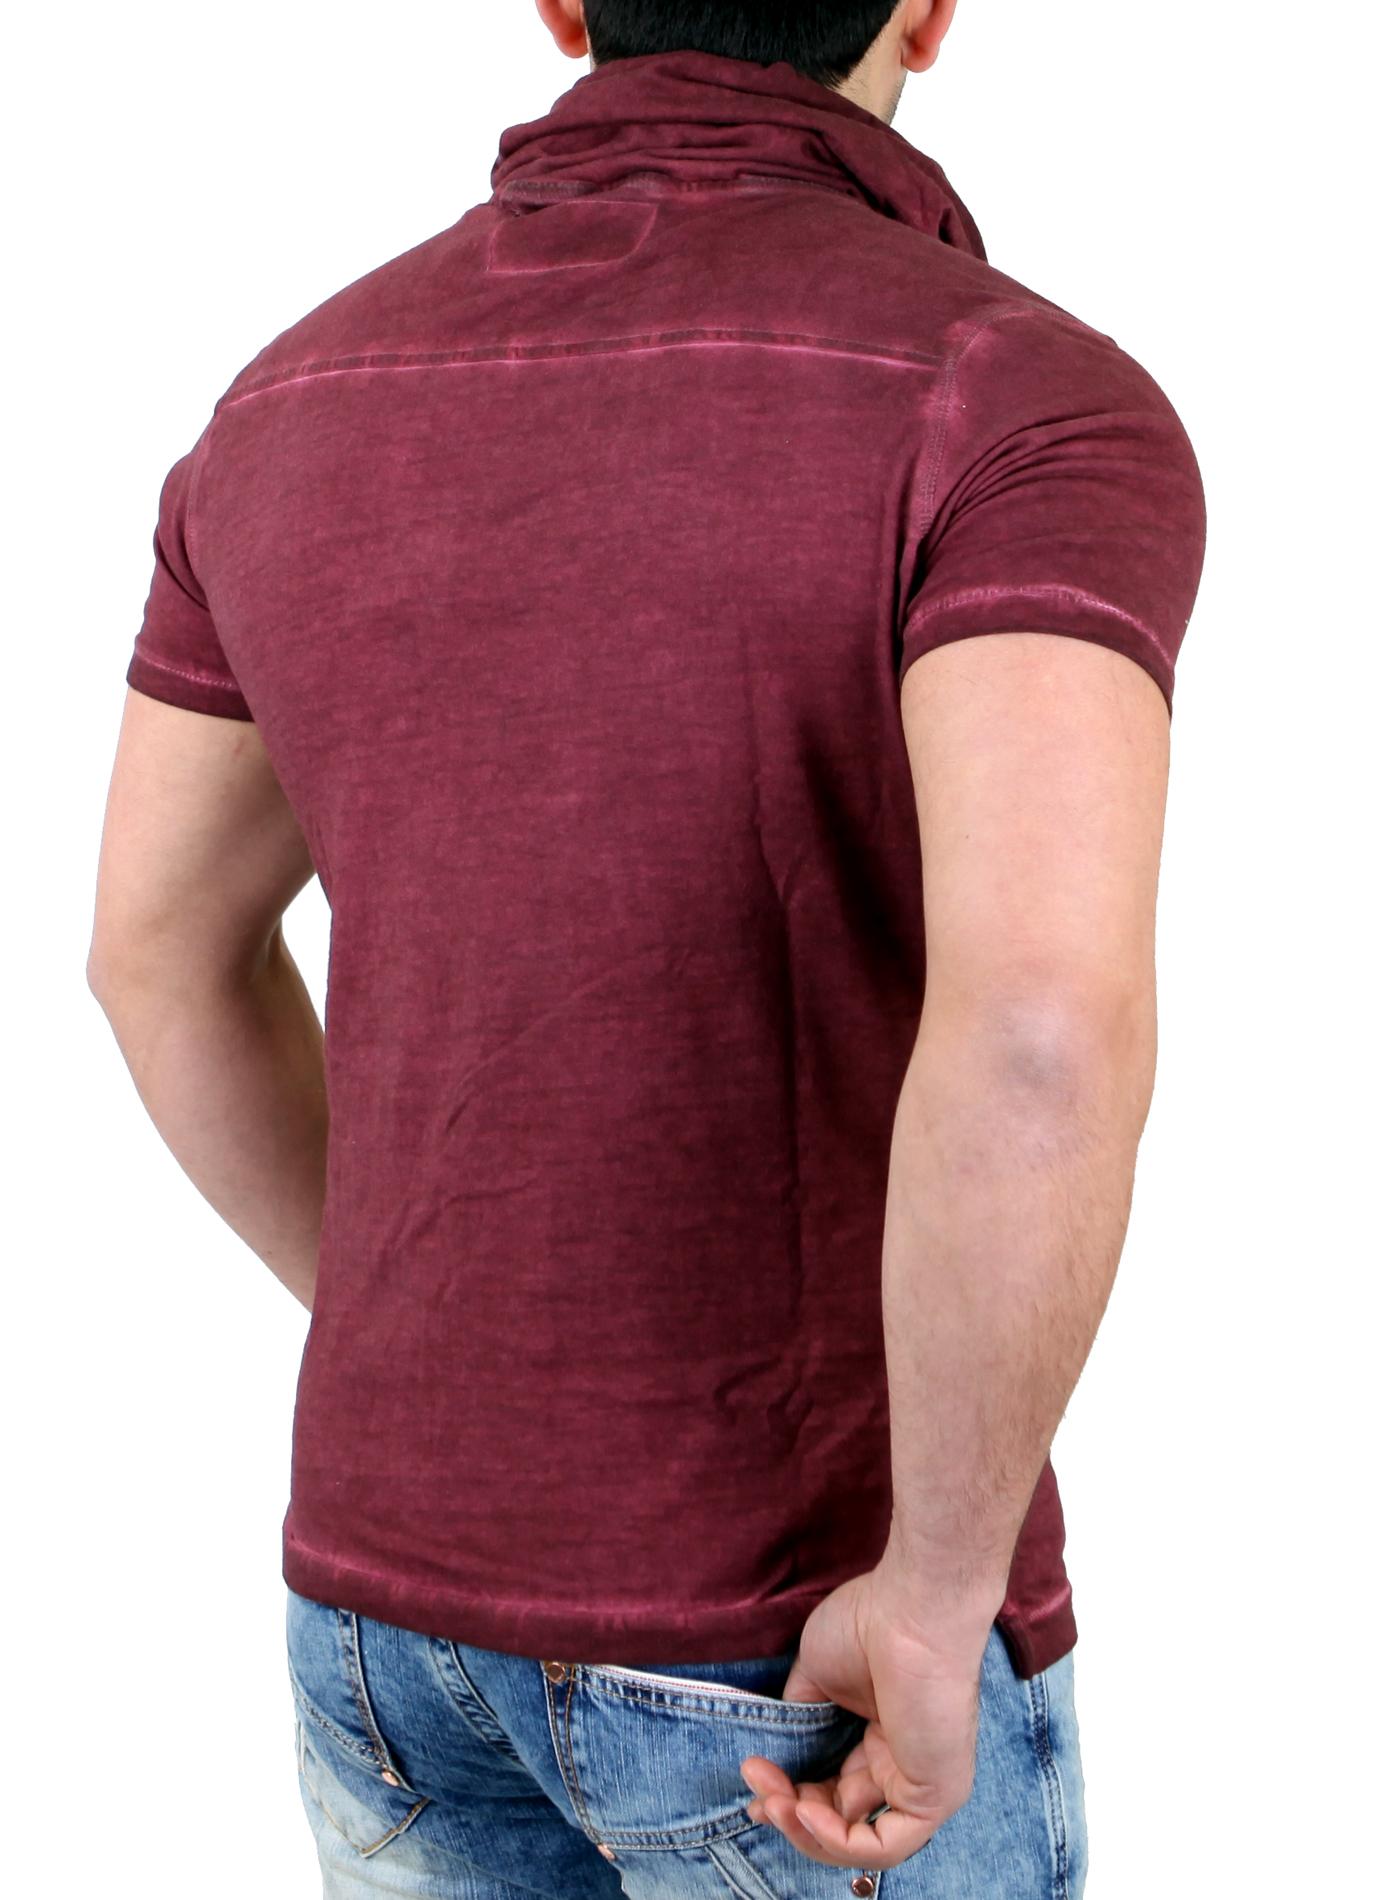 vsct hoher kragen t shirt mit schalkragen party hemd shirt neuss. Black Bedroom Furniture Sets. Home Design Ideas